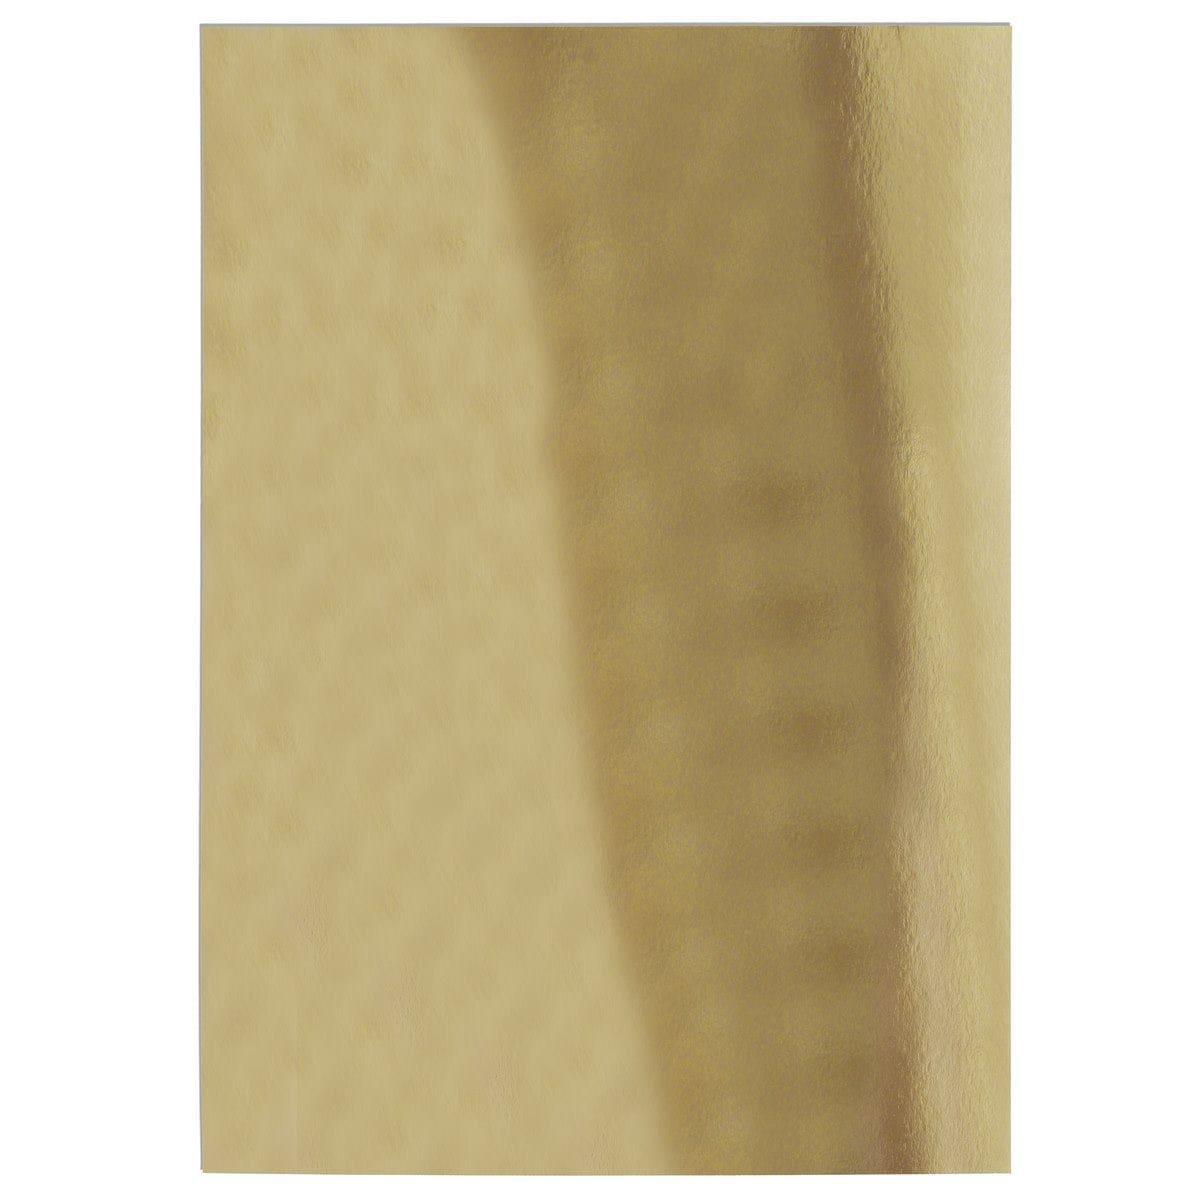 A4 Metallic Craft Paper